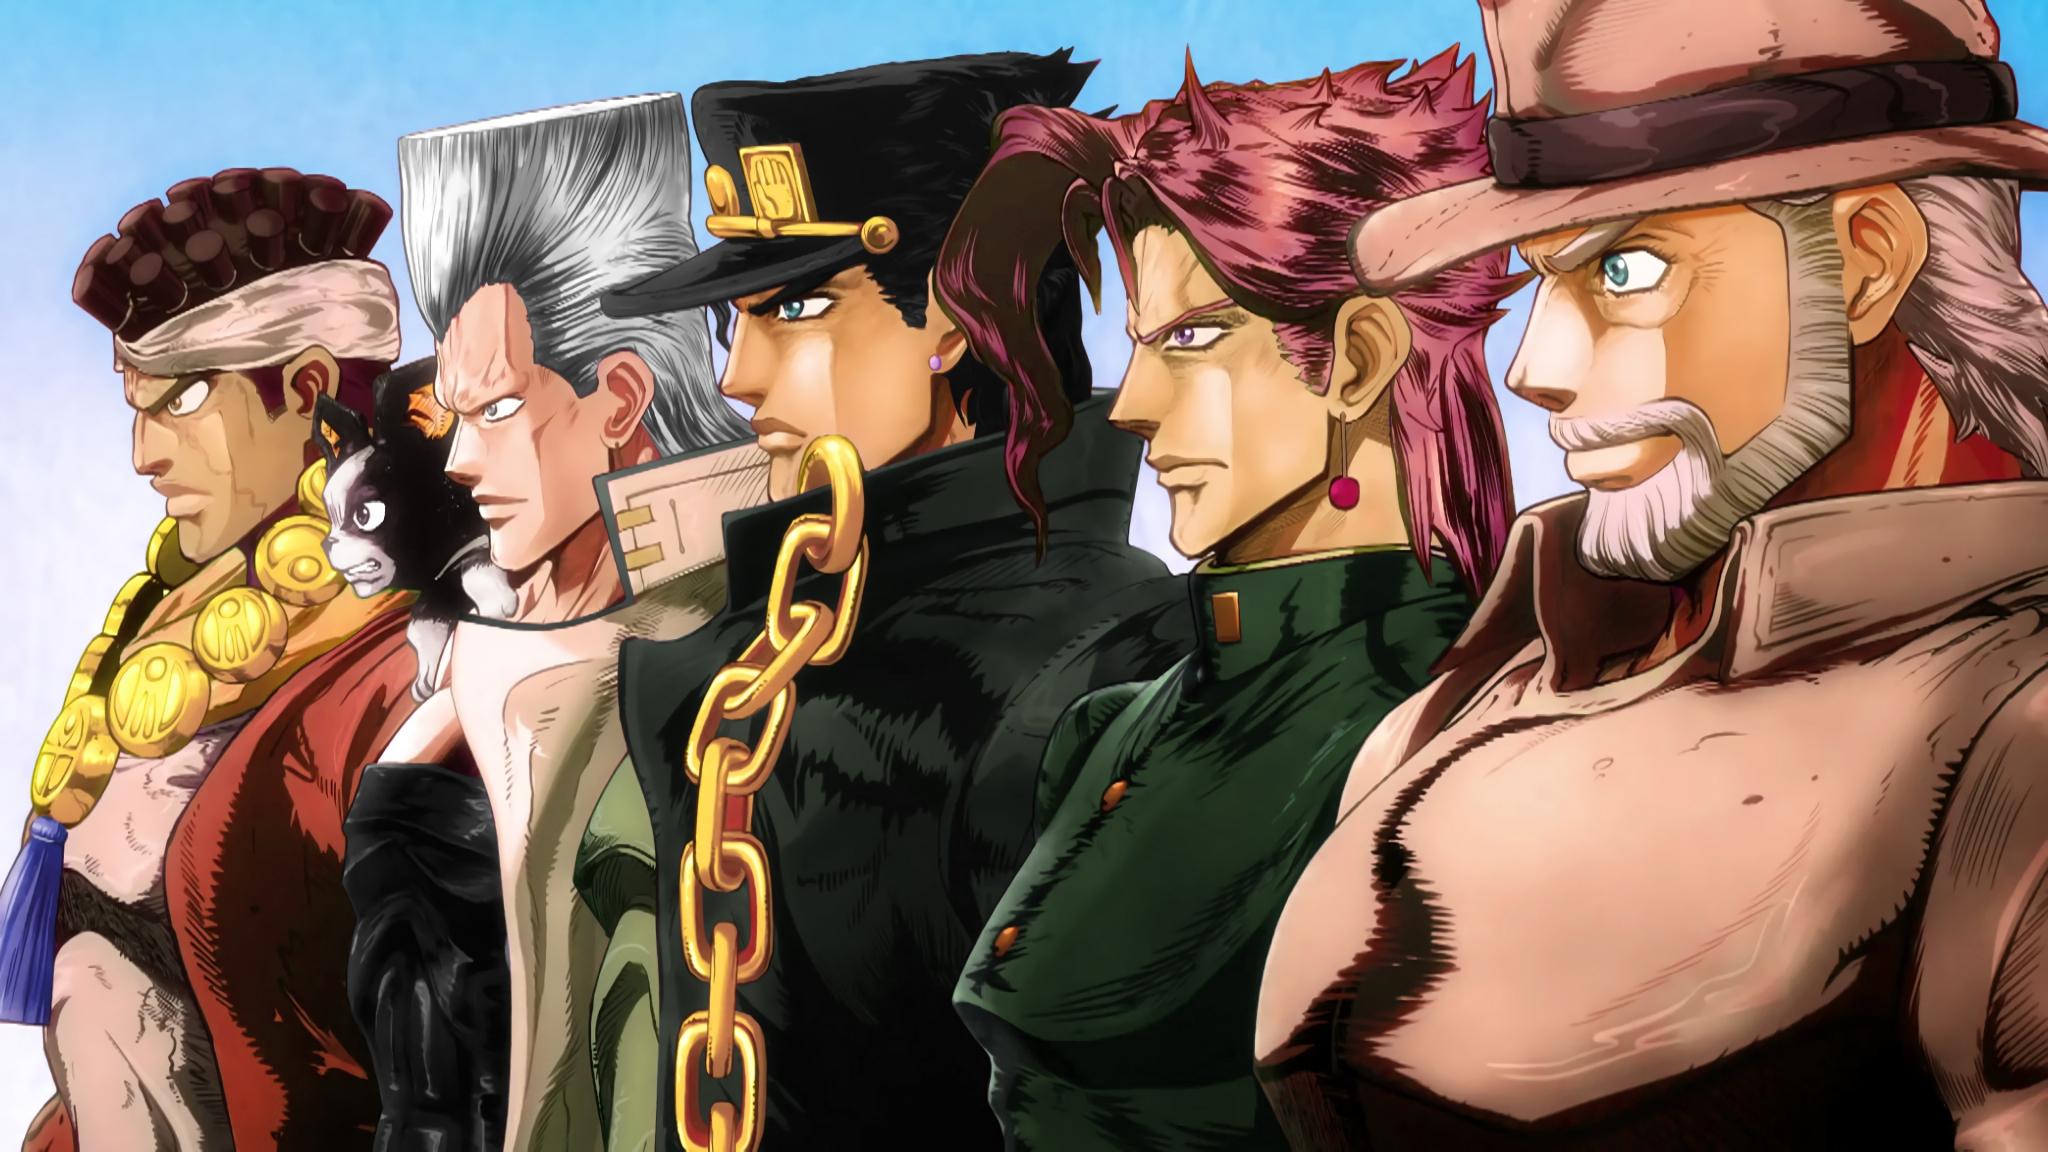 Download 2048x1152 Wallpaper Anime Boys Jojo S Bizarre Adventure